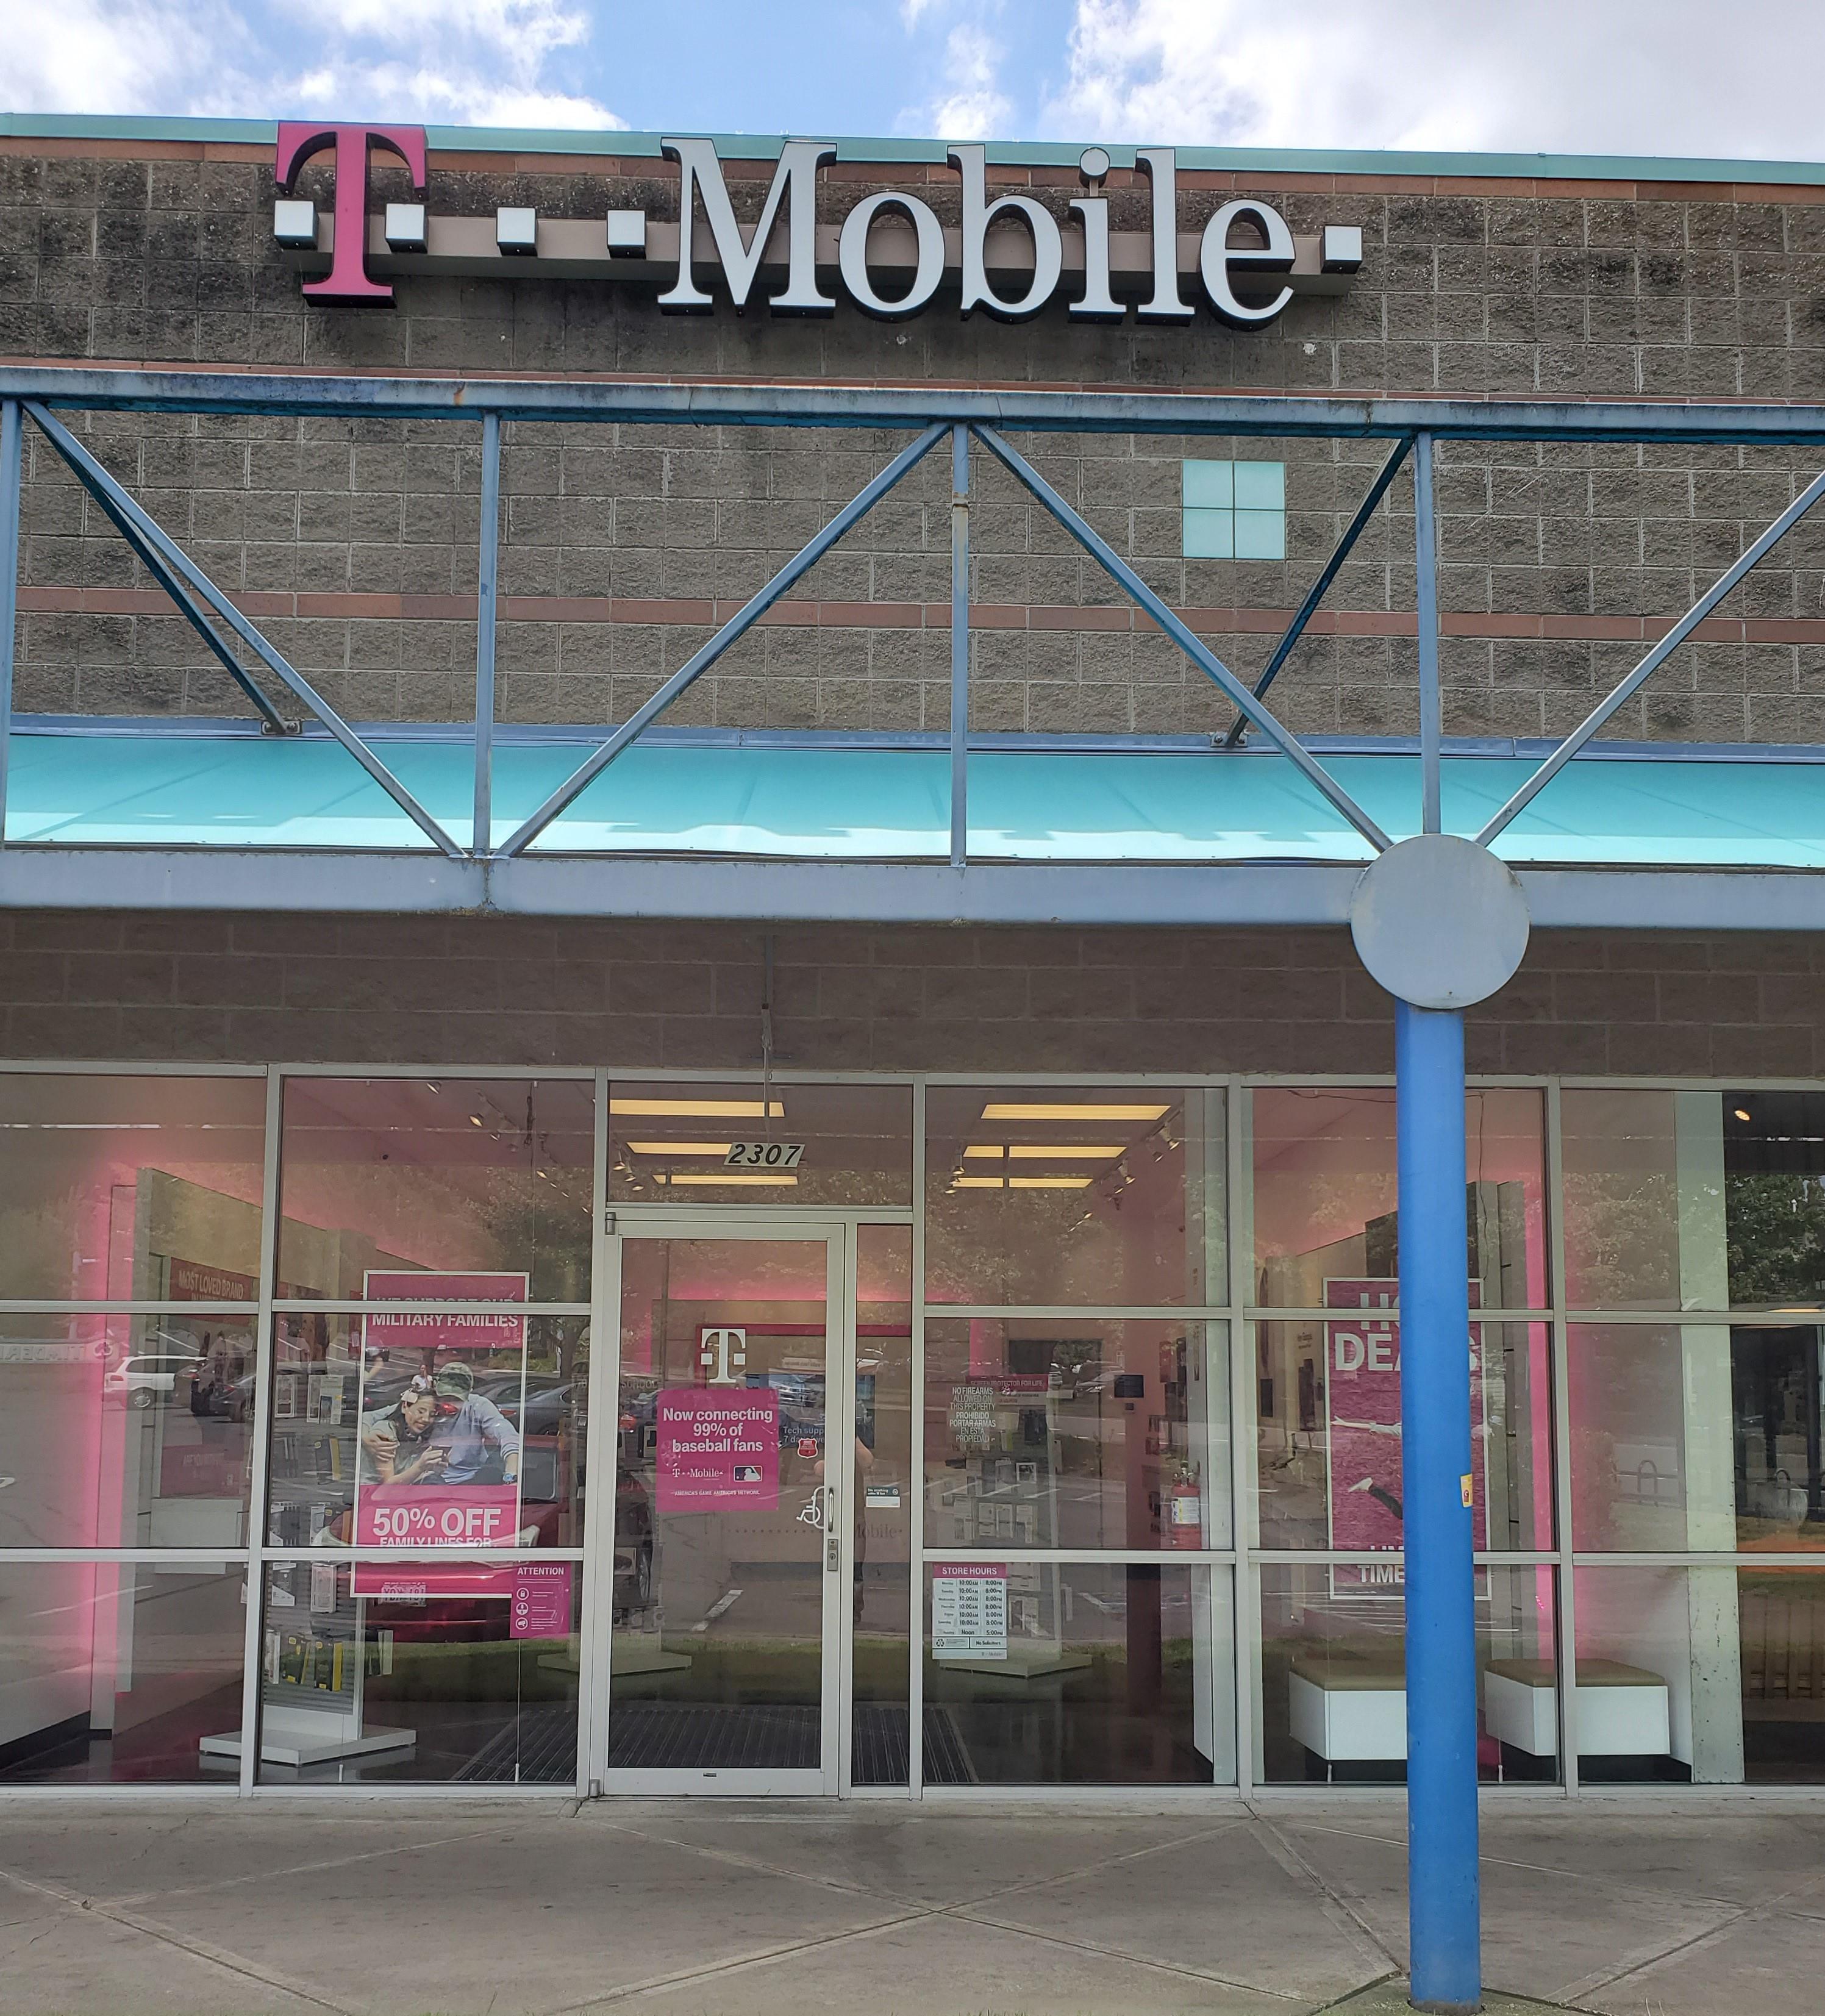 T-Mobile Corvallis (541)758-2003